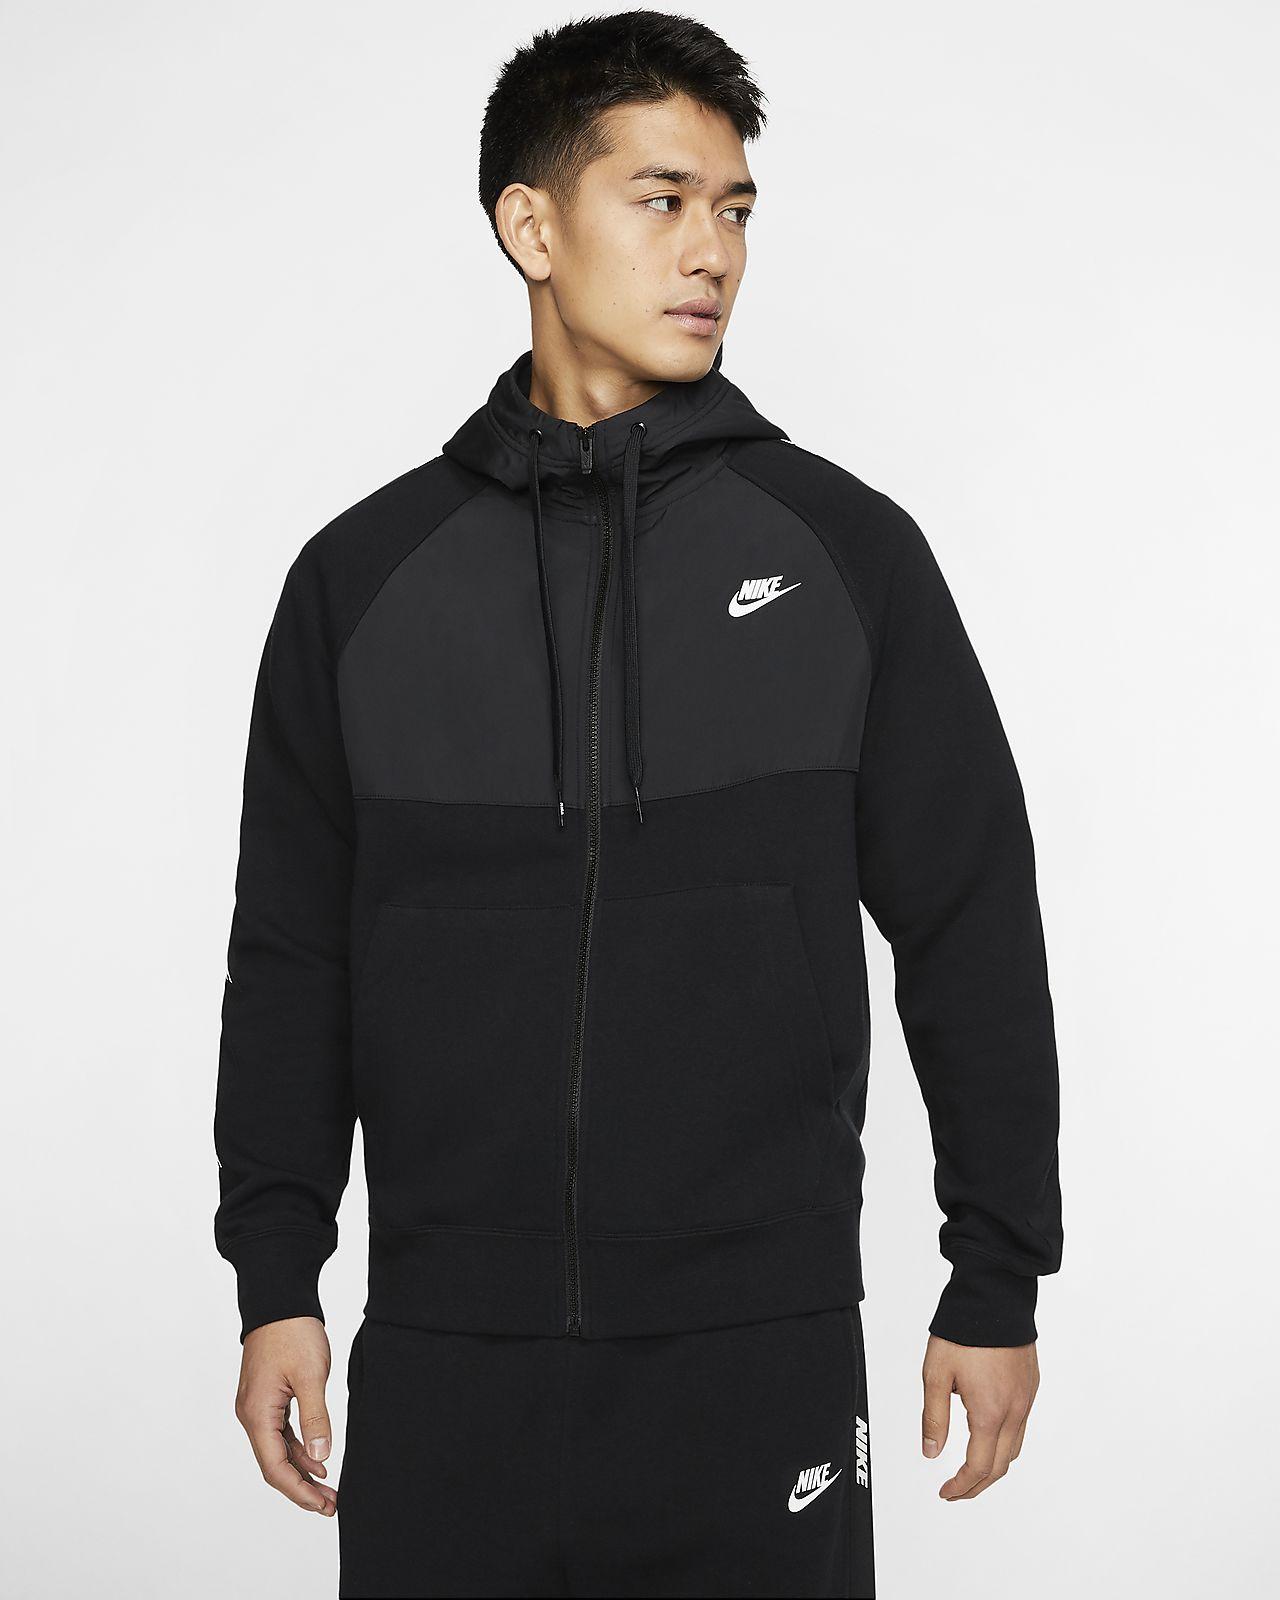 Nike Sportswear 男子全长拉链开襟连帽衫